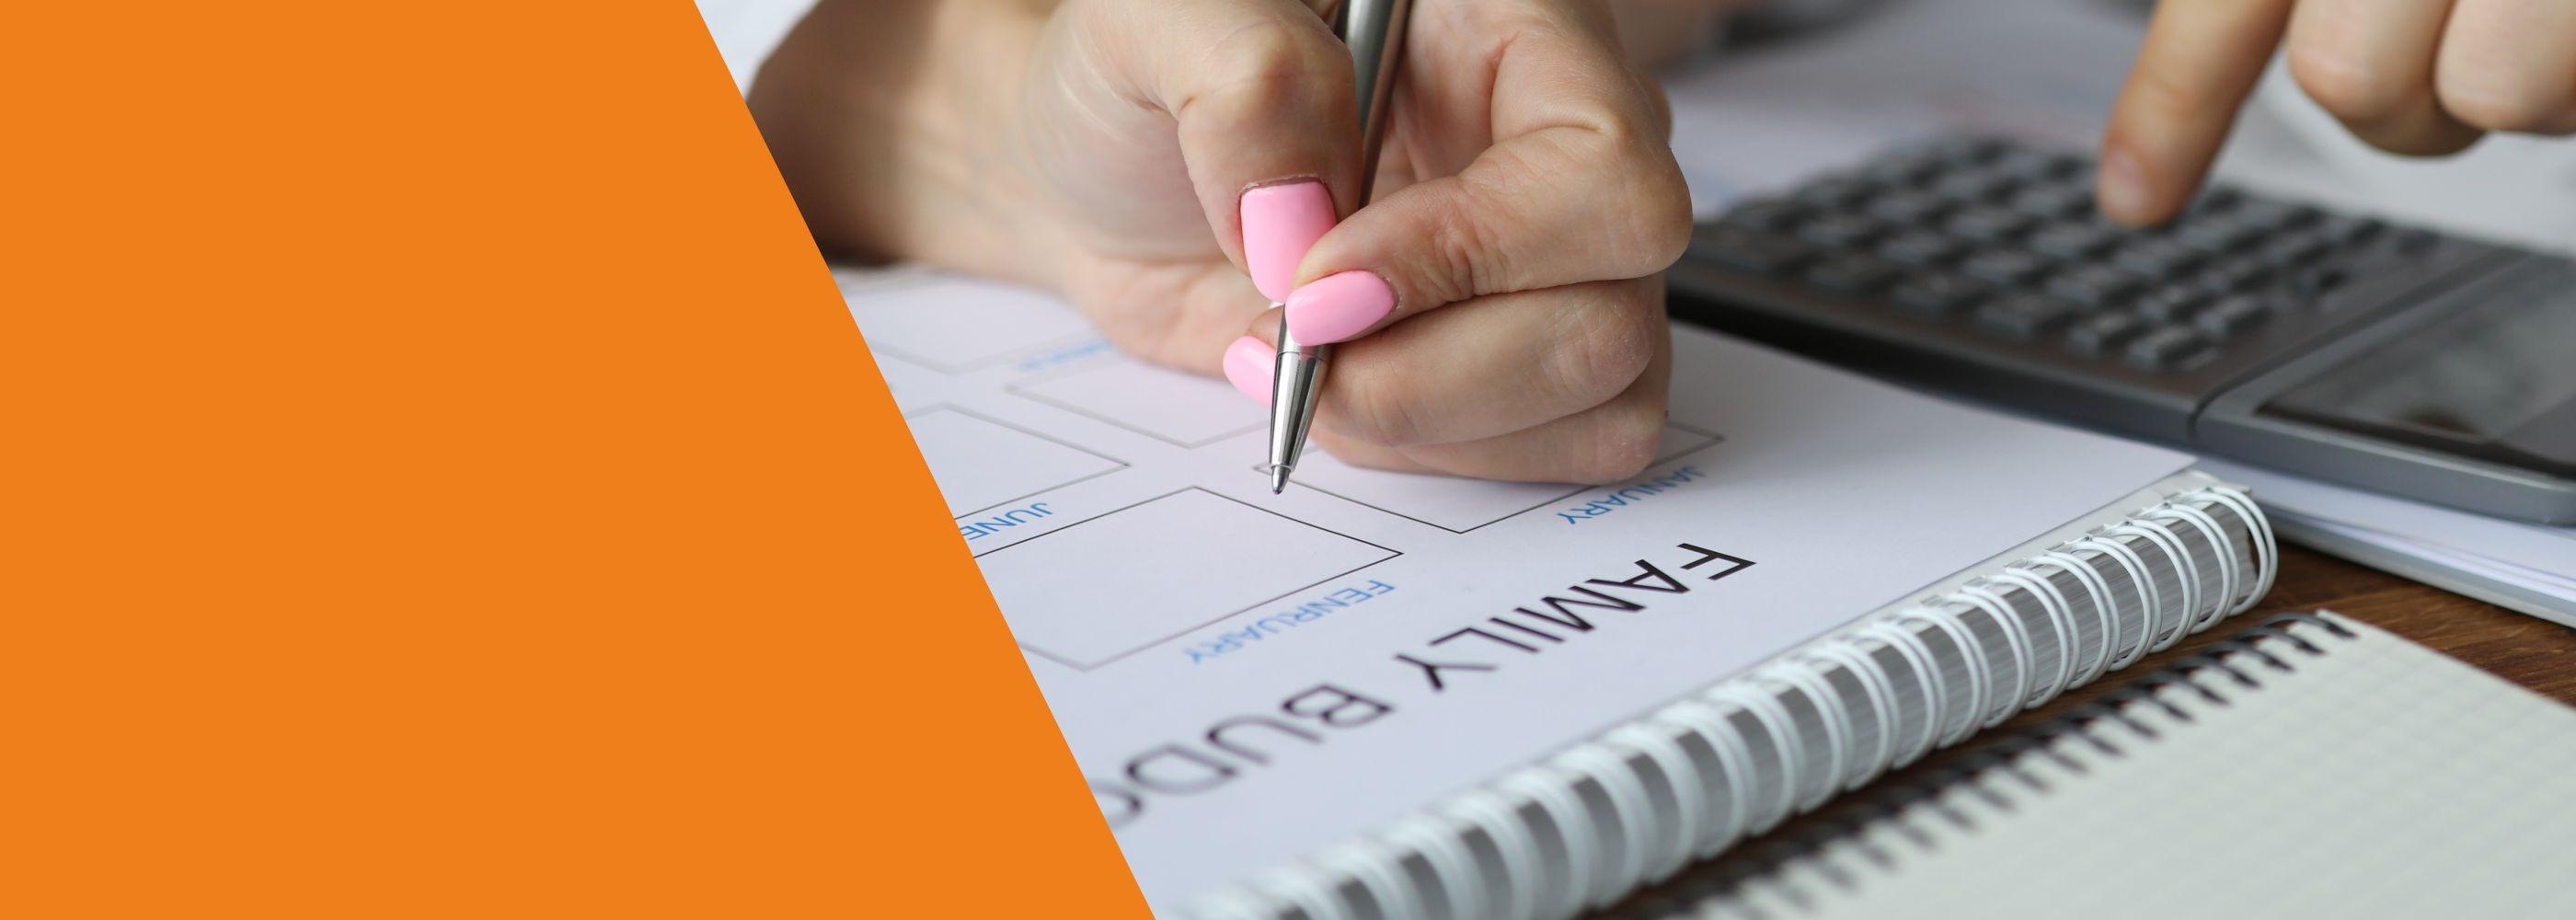 MyPrivate - Finance